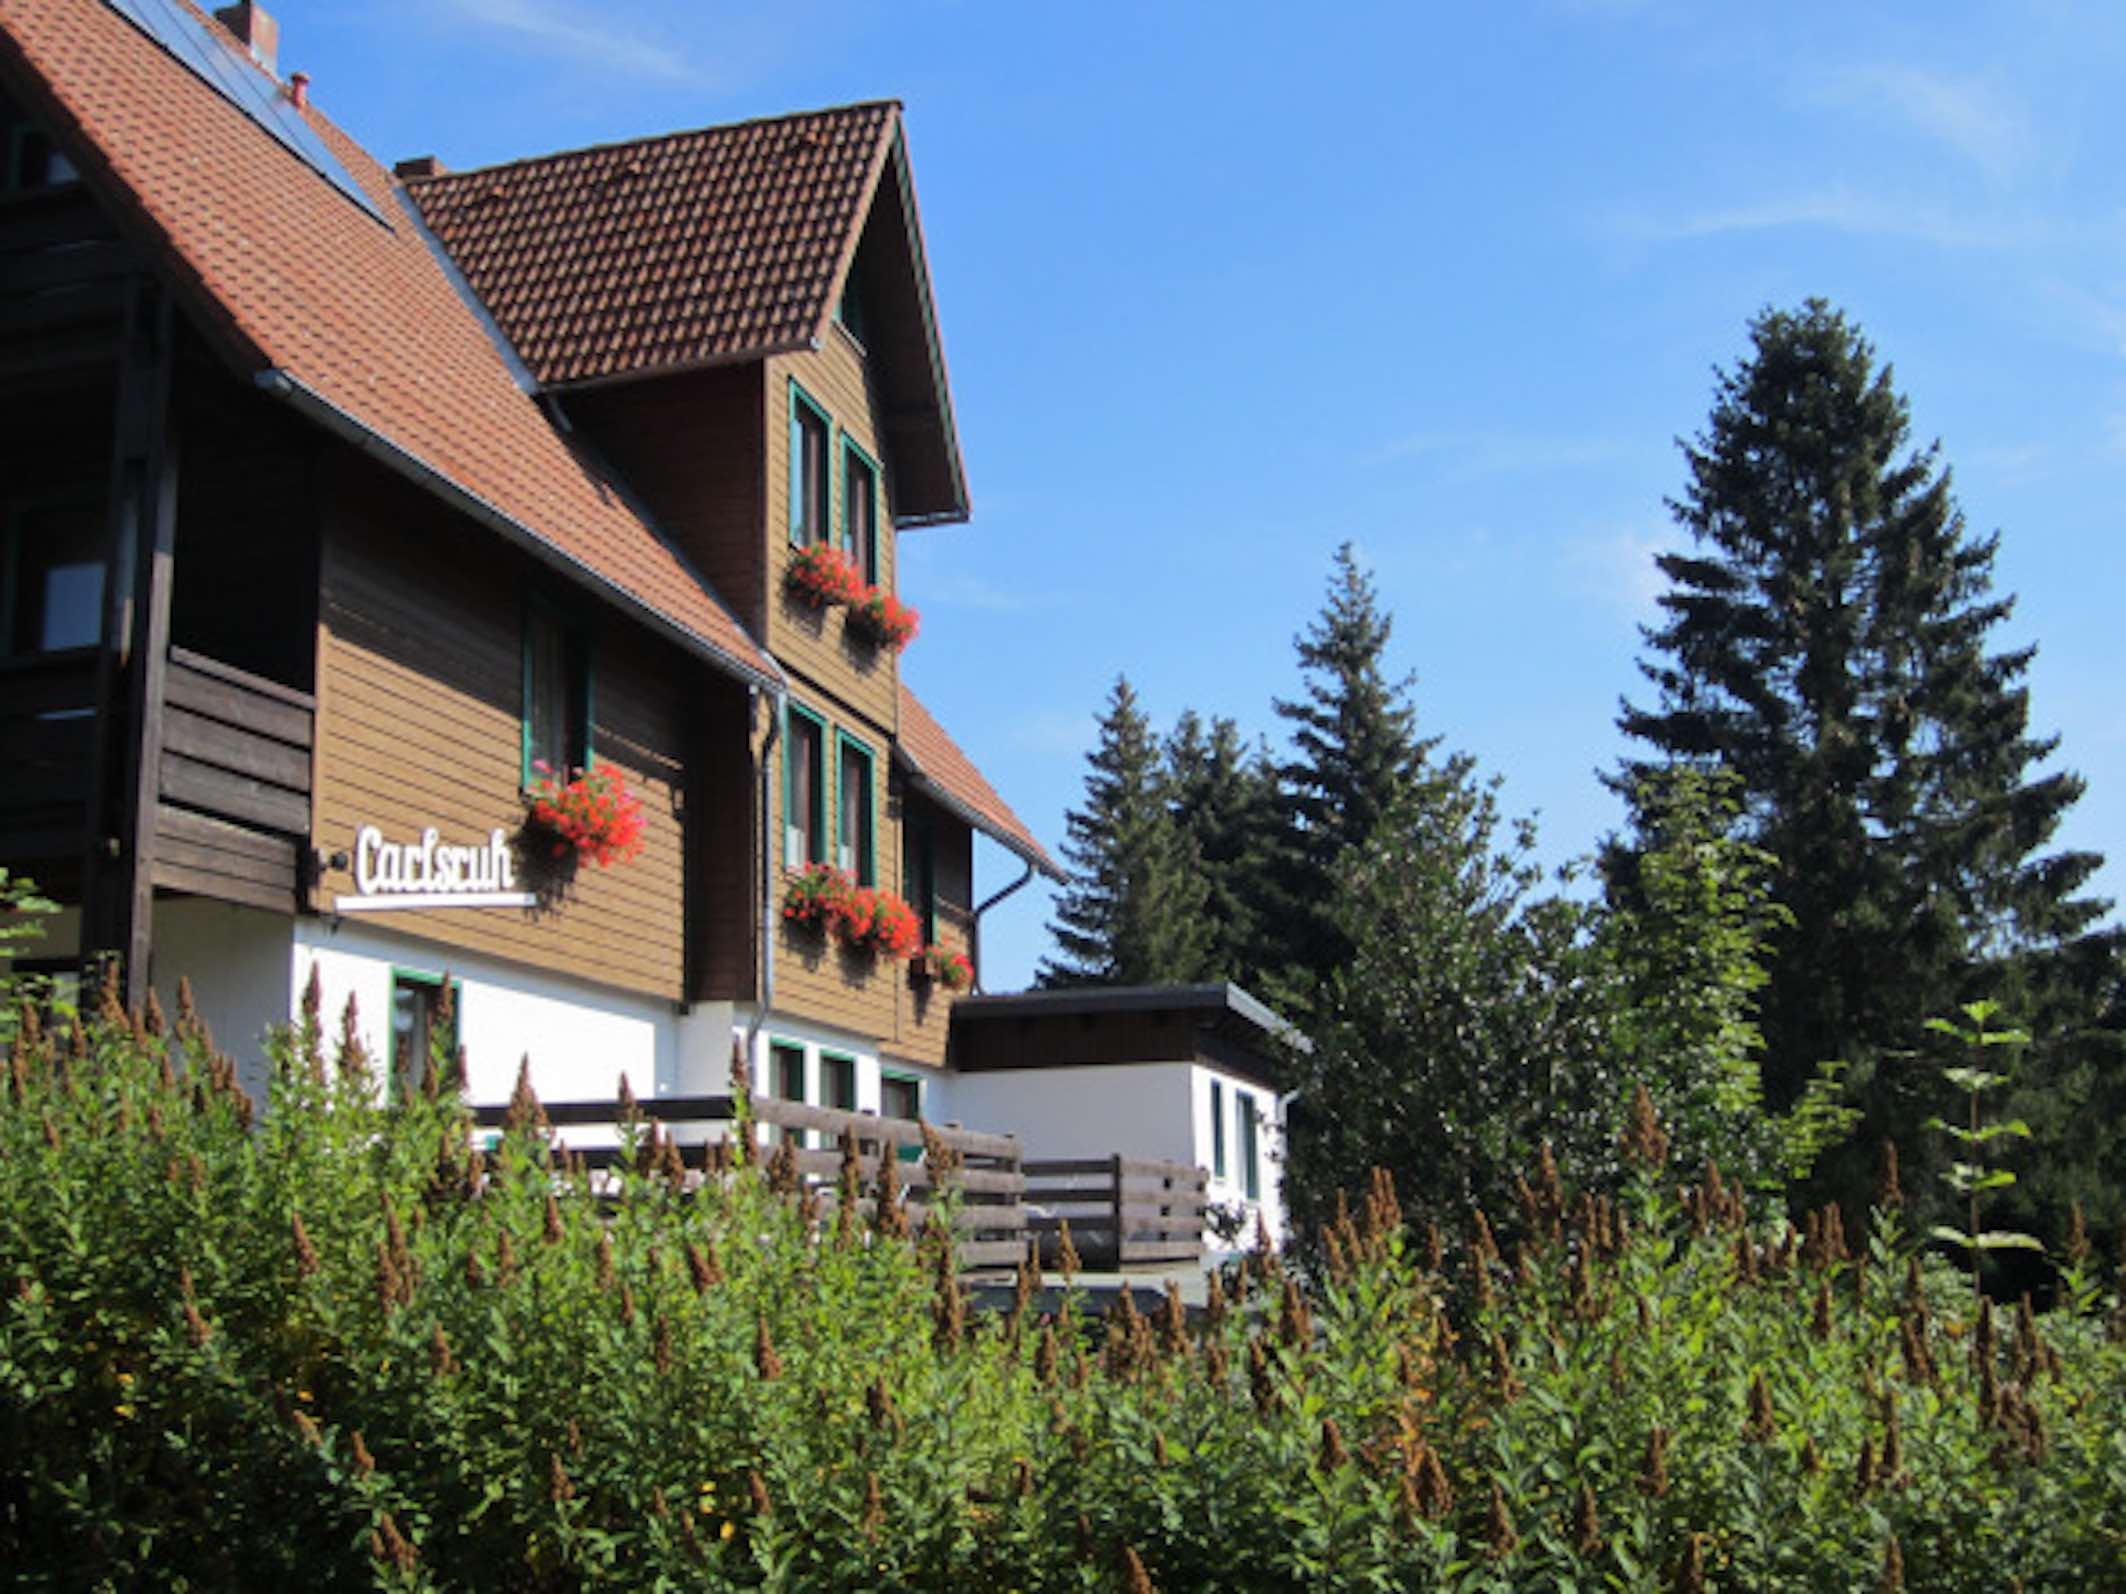 Hotel Carlsruh in Braunlage (Foto: Hotel Carlsruh)